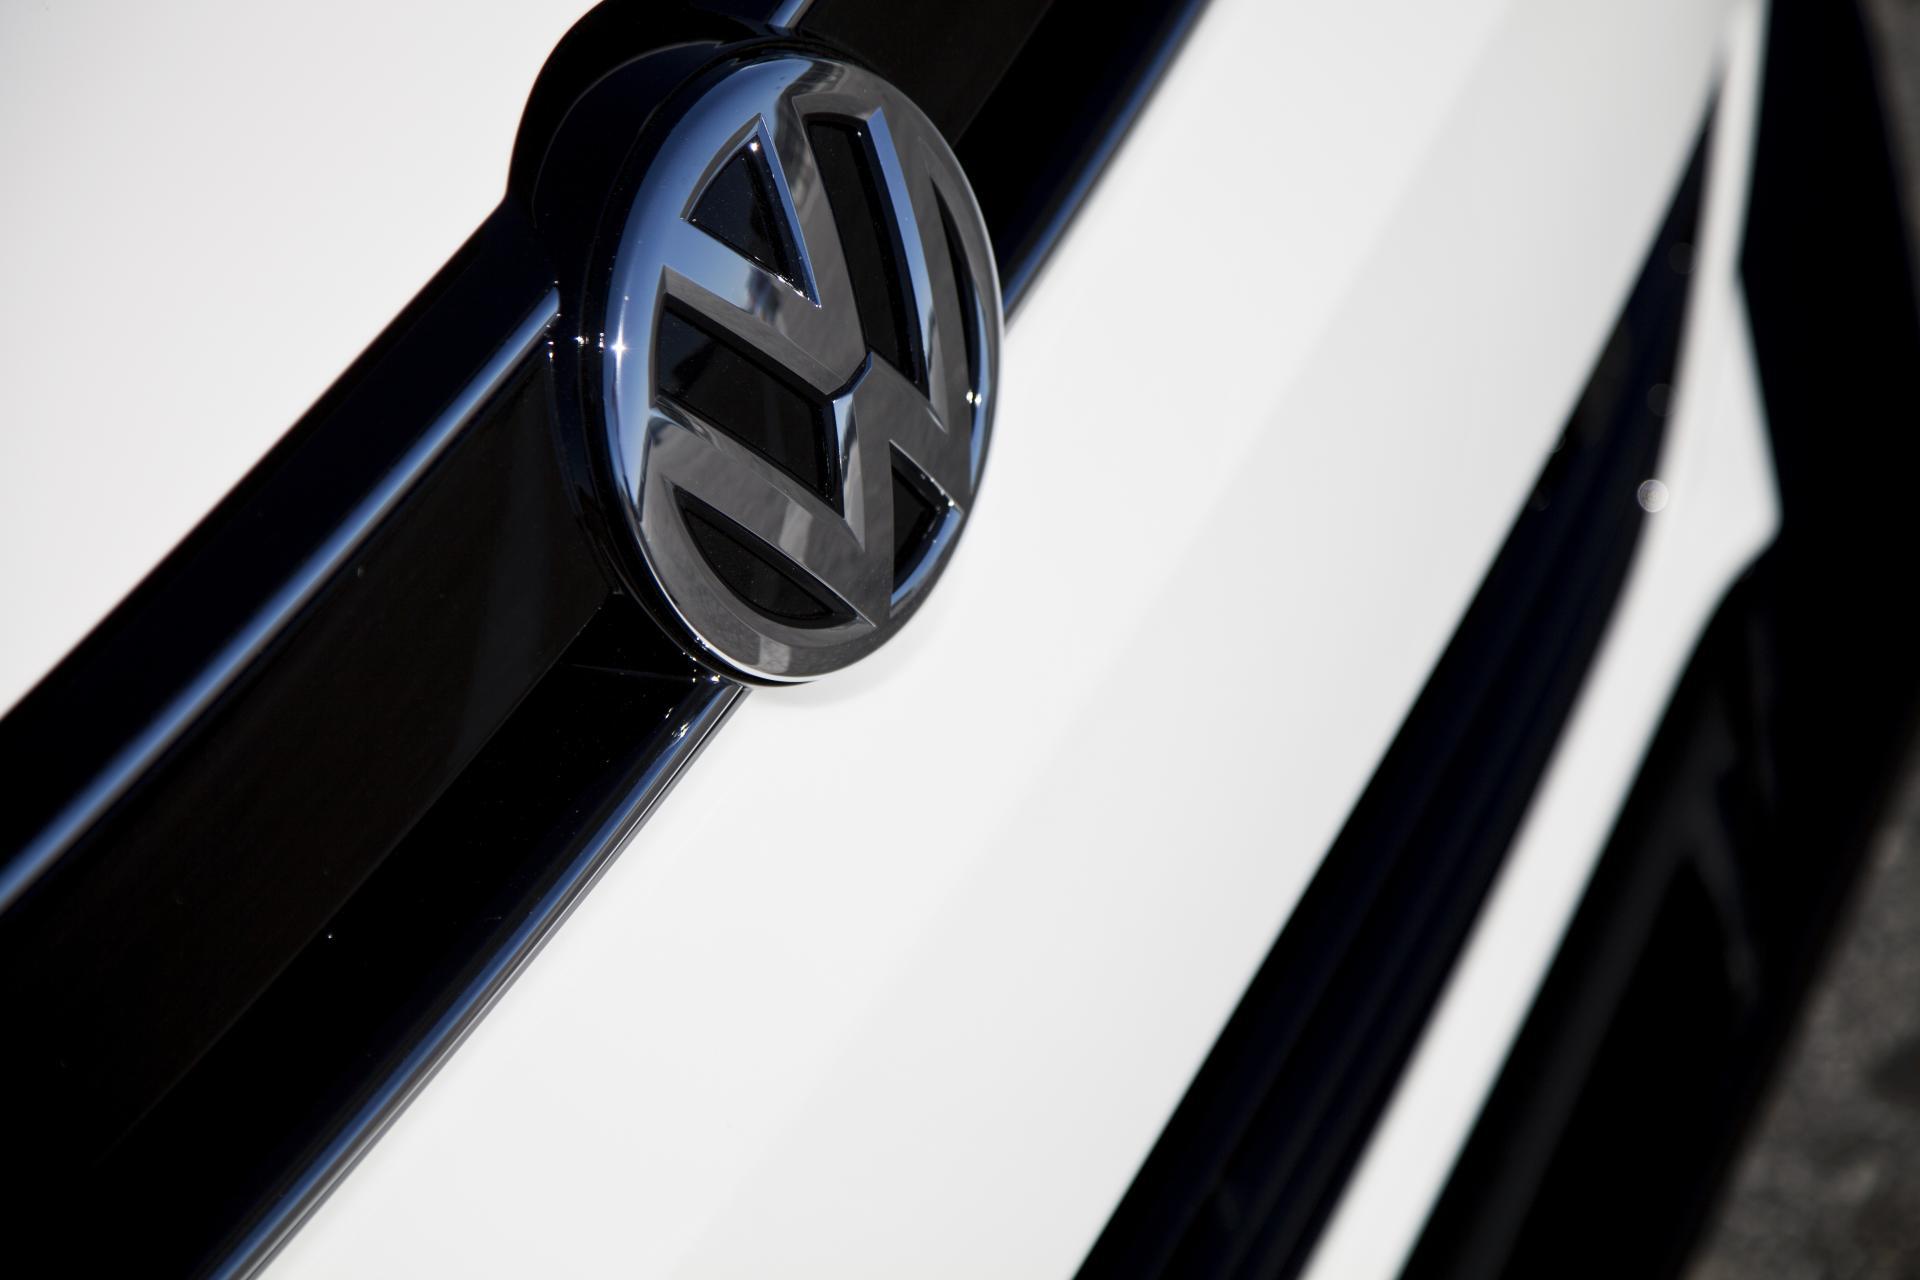 2014 Volkswagen FMS Performance Jetta